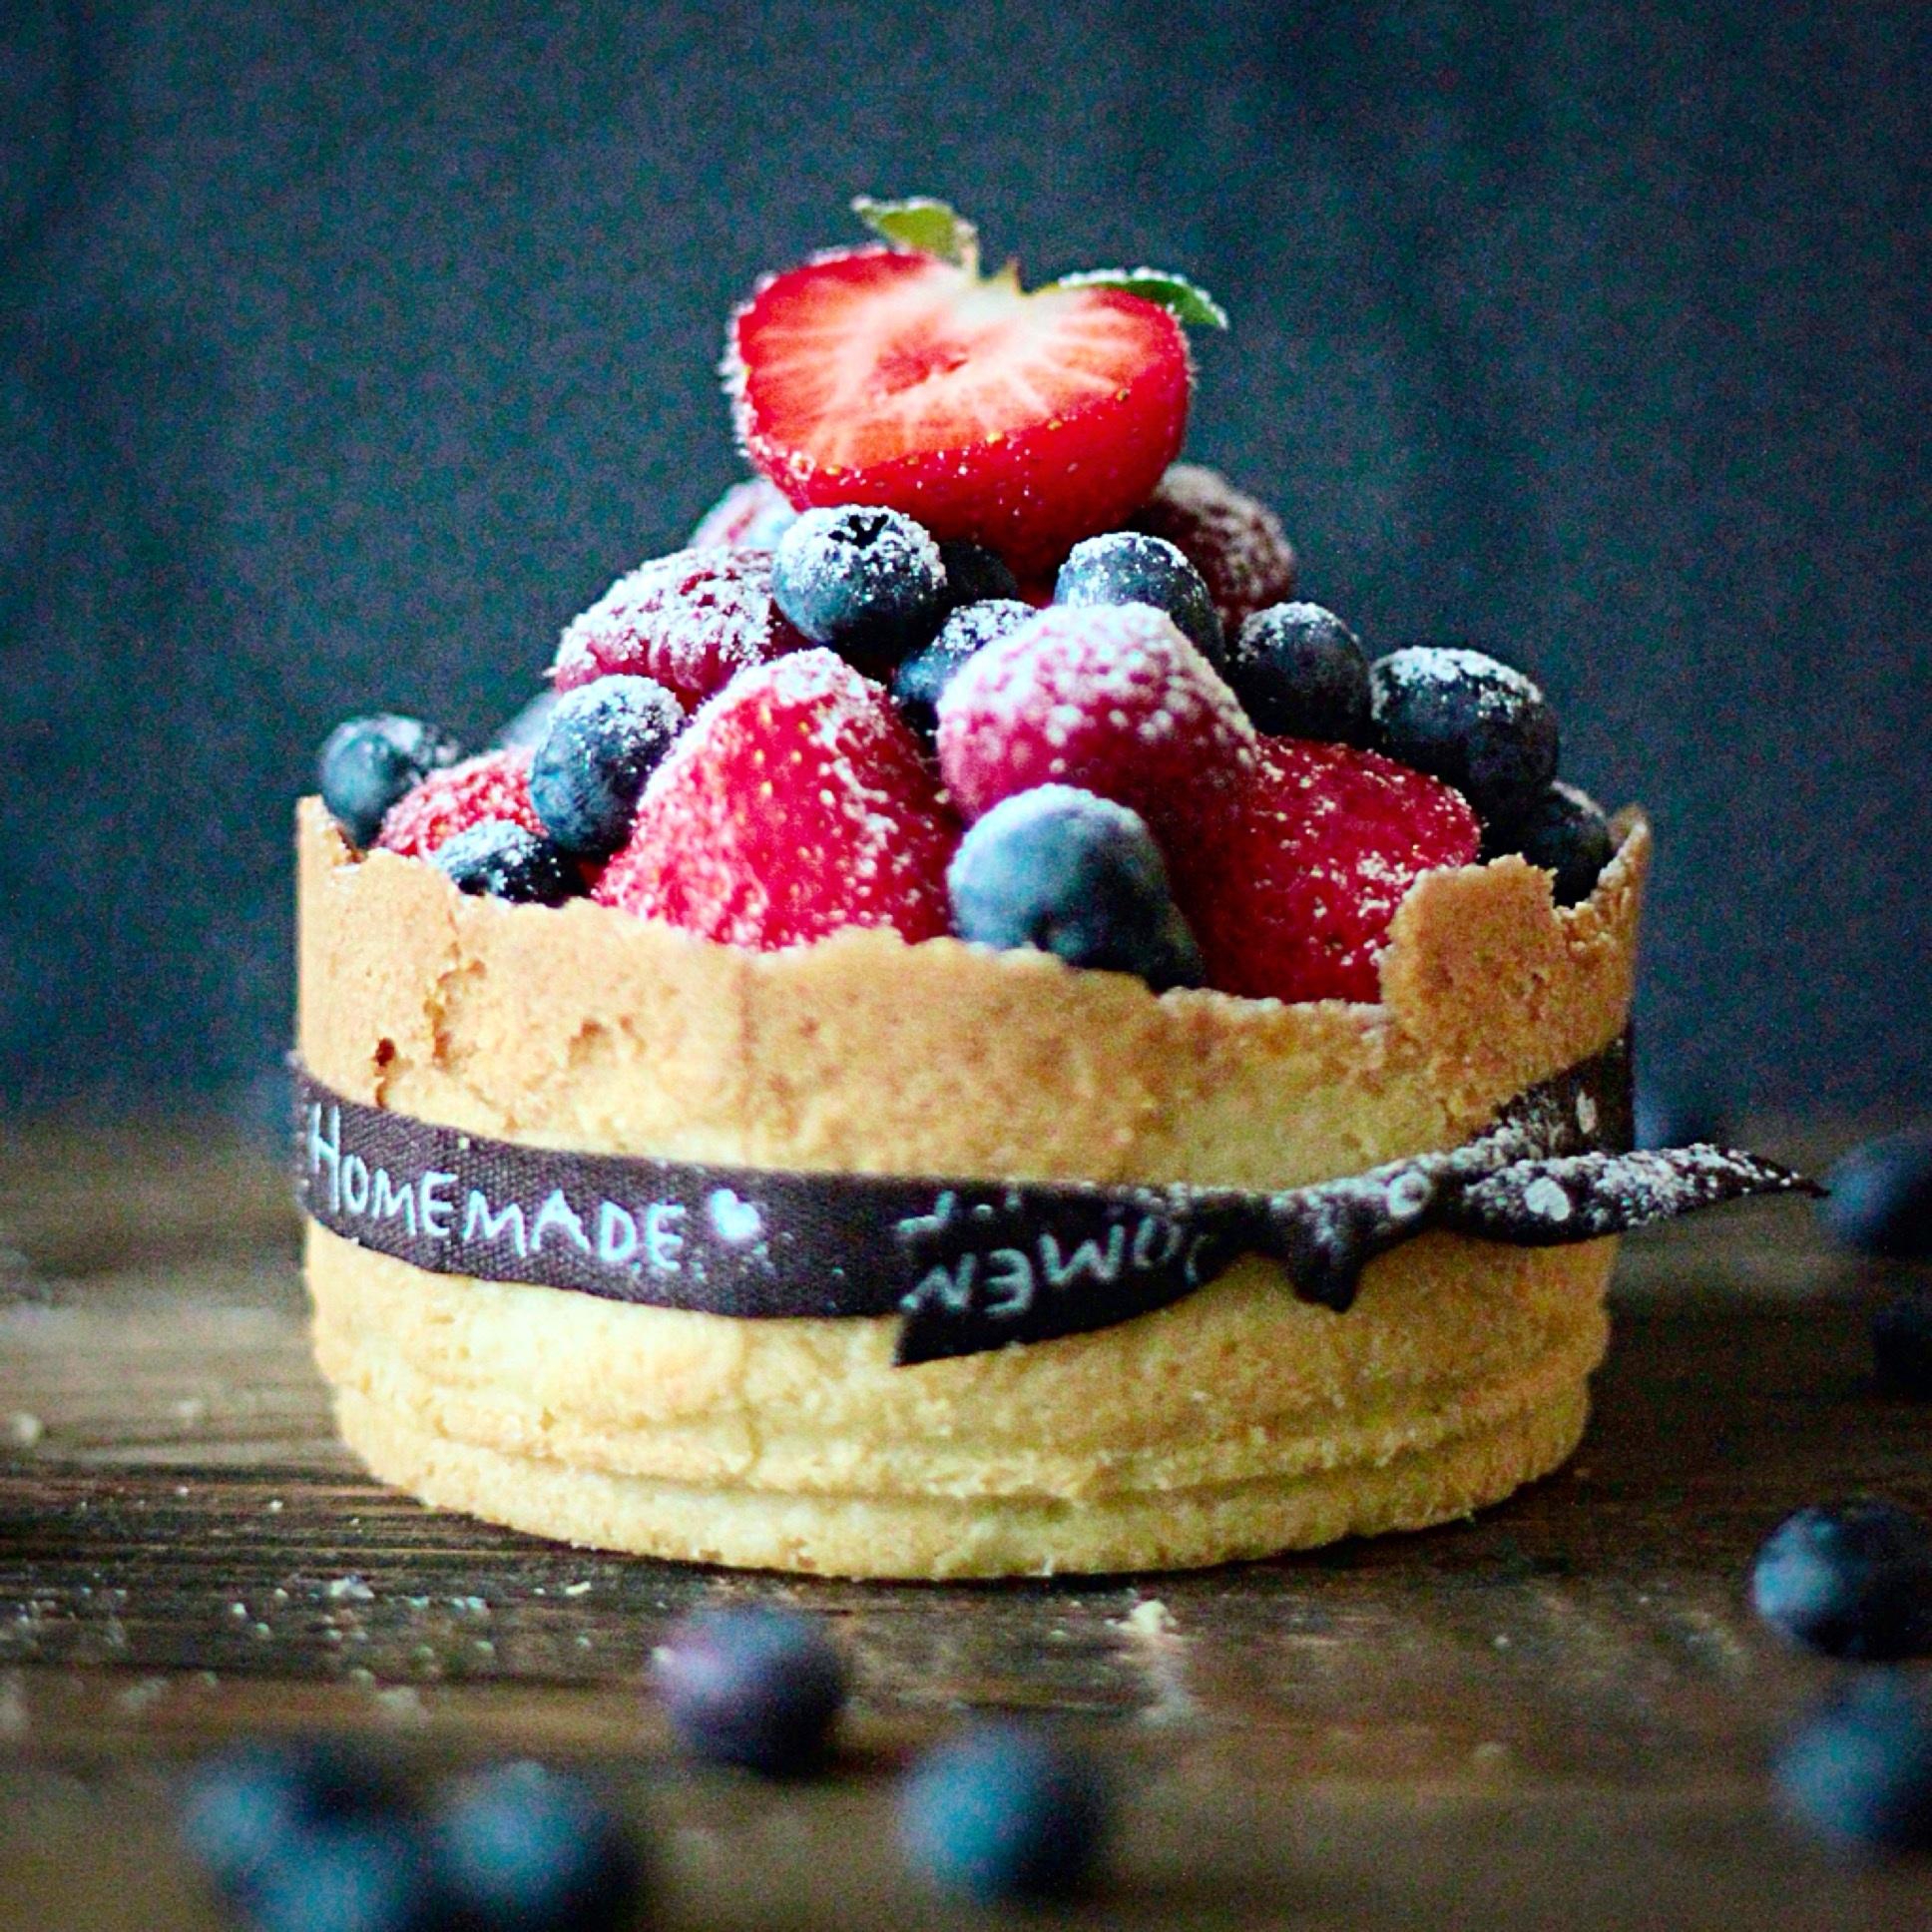 fruta baya plato comida comida produce desayuno postre pastel tarta fresa pastel de cumpleaos formacin de